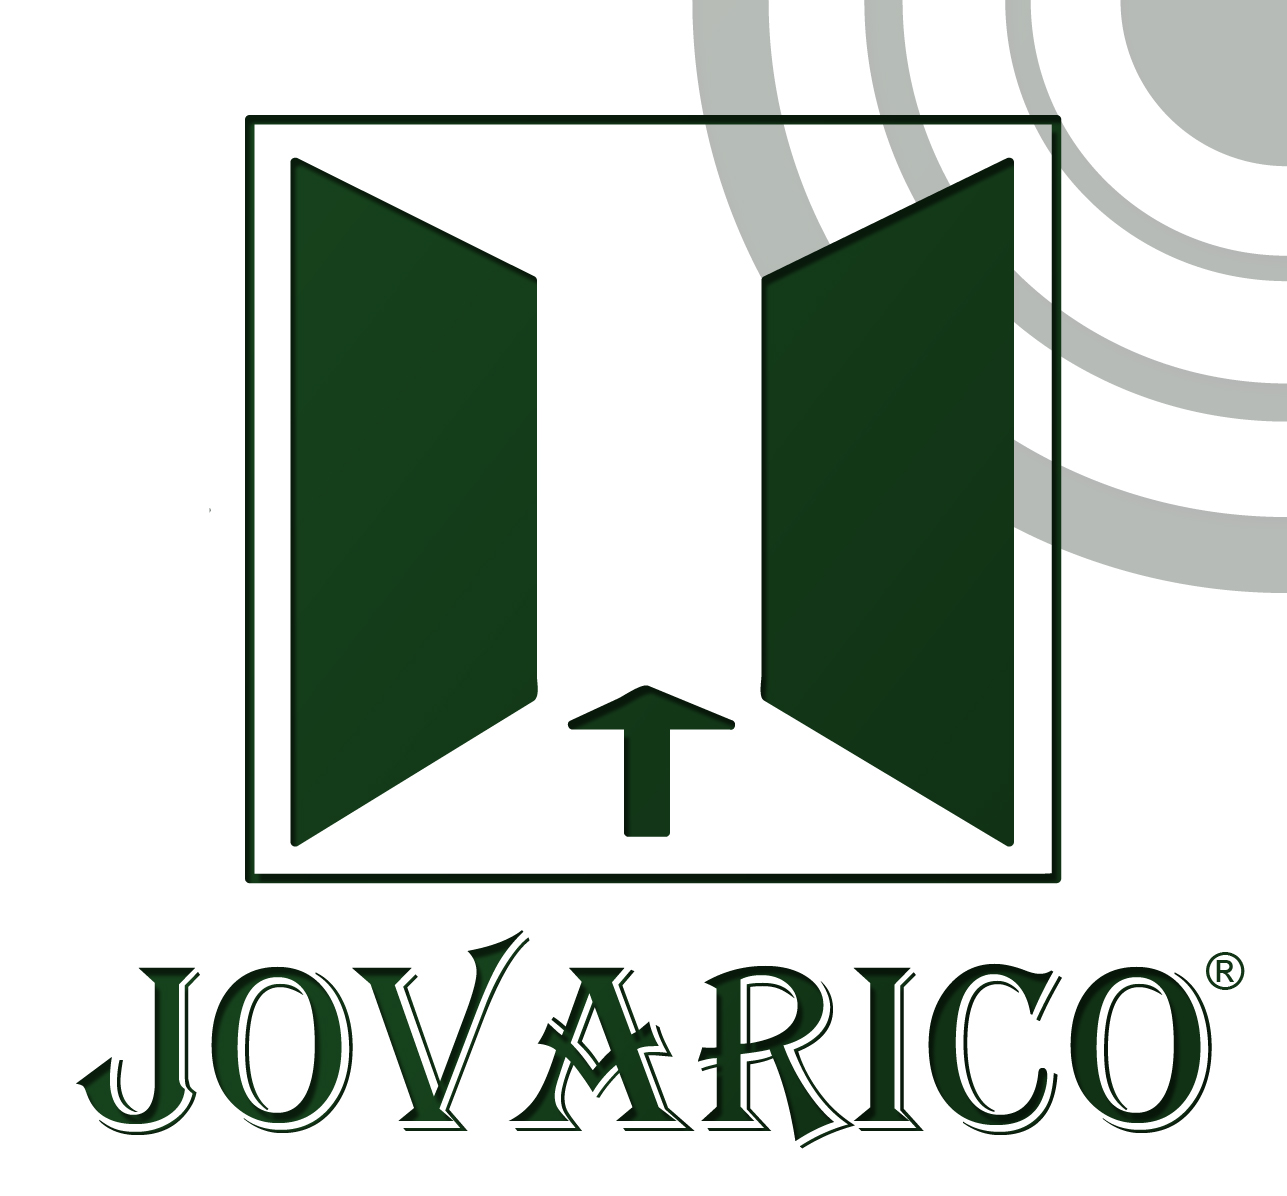 JOVARICO